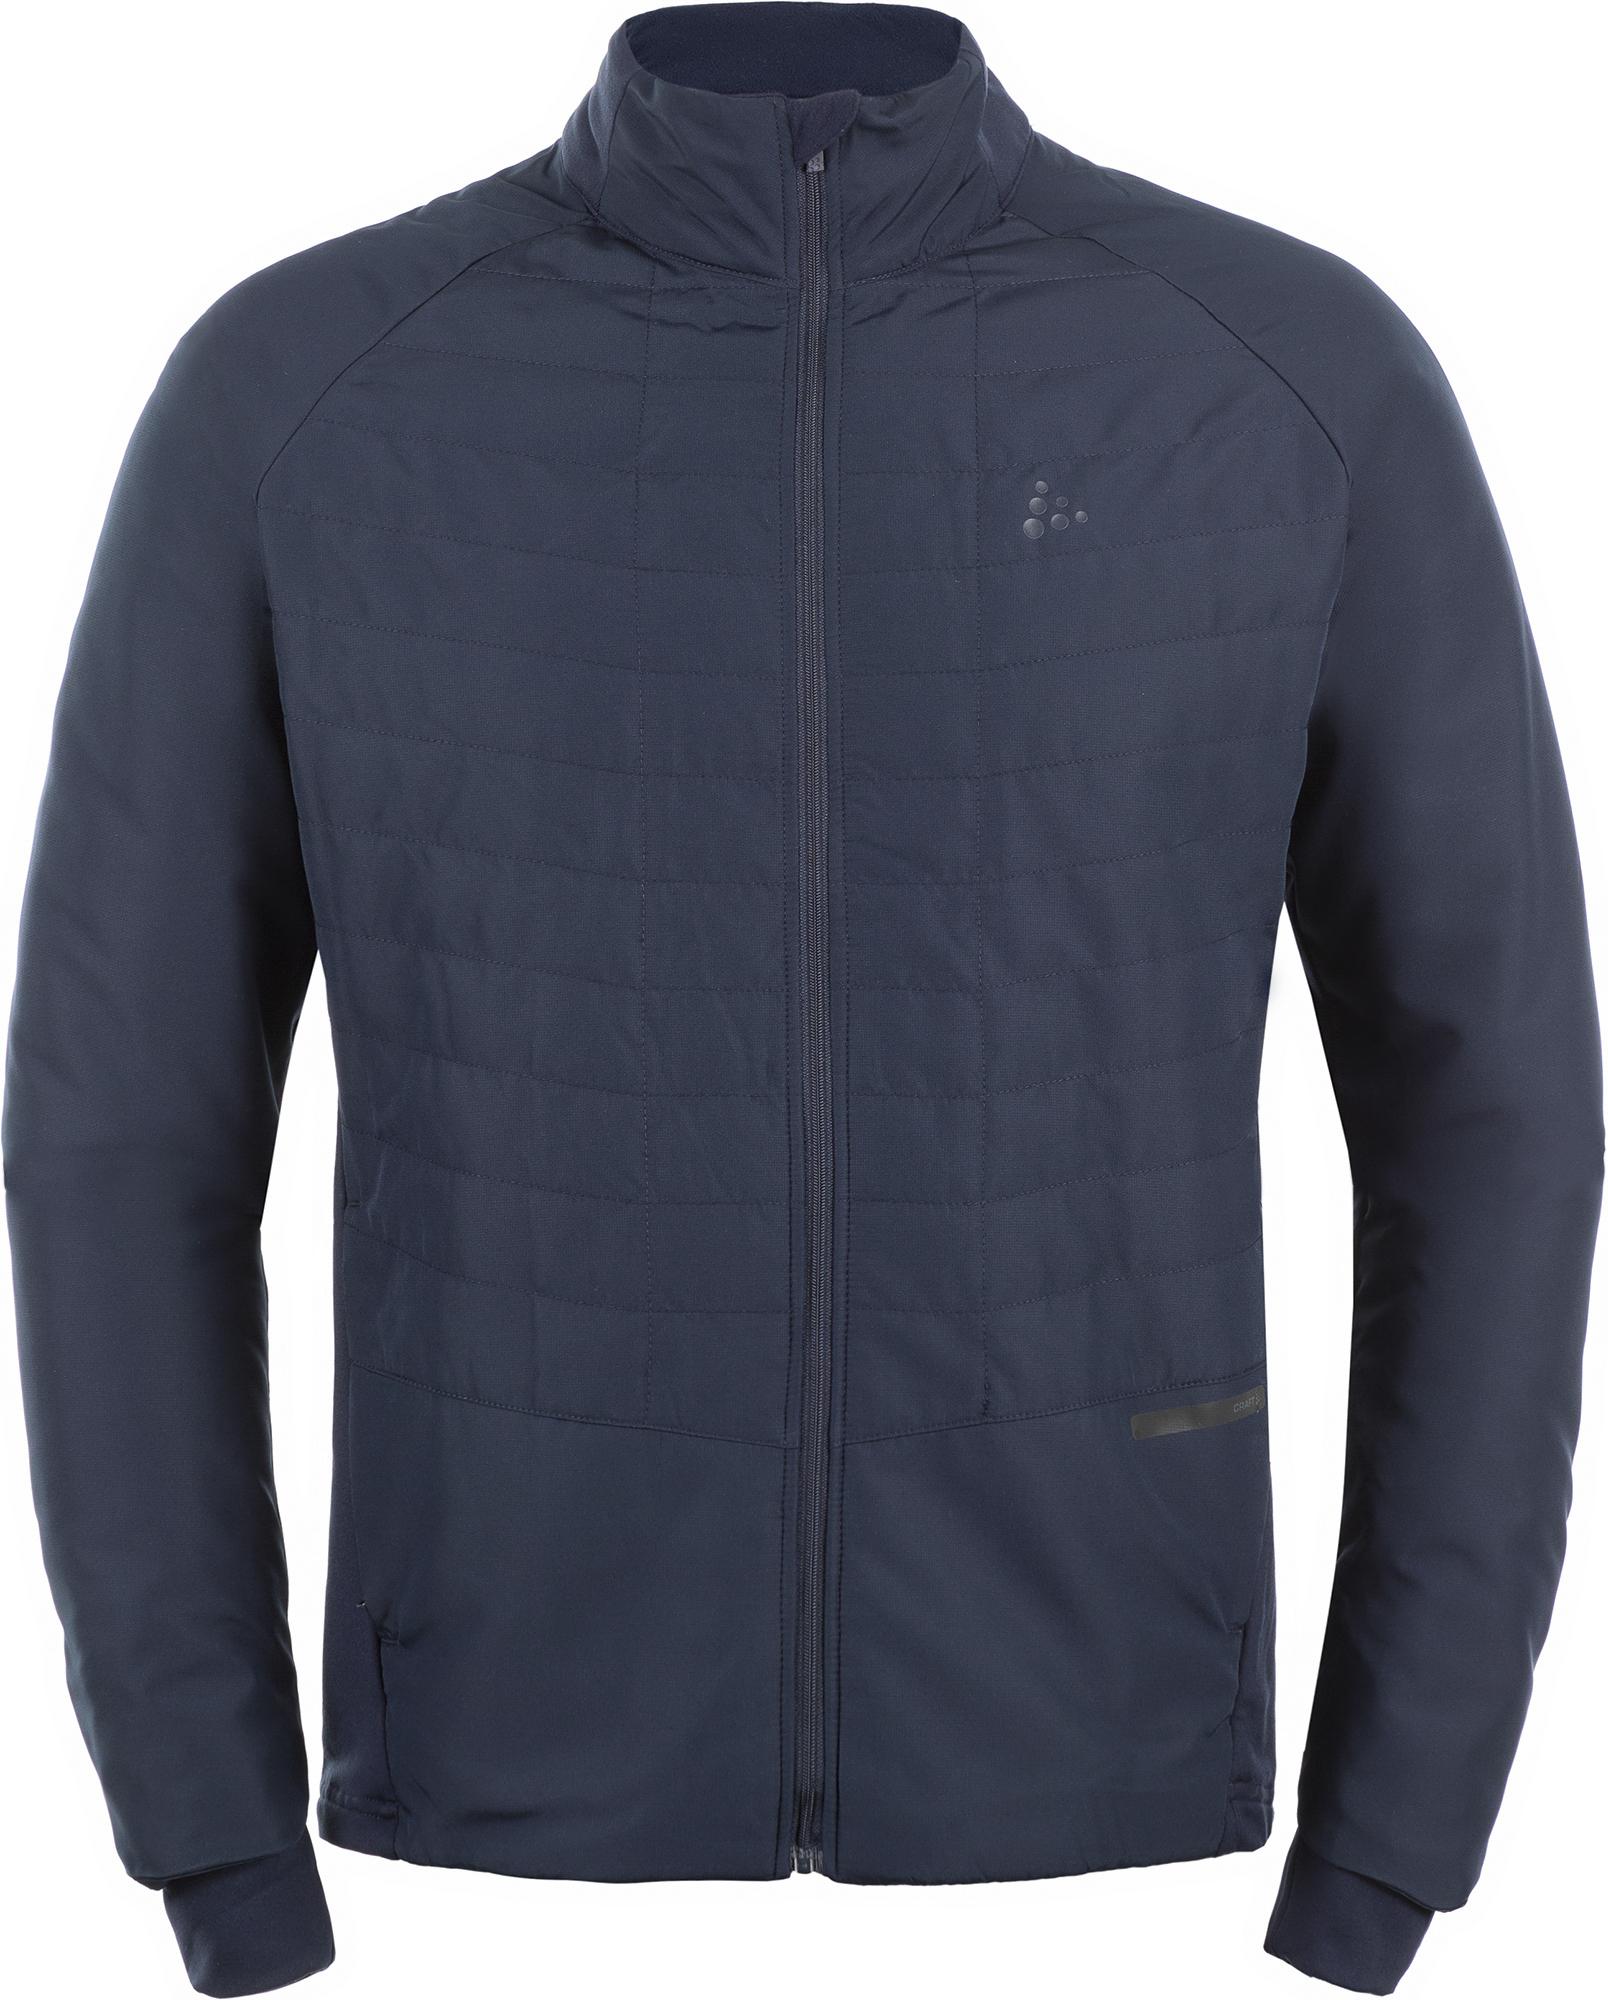 Craft Куртка мужская Storm Thermal, размер 54-56